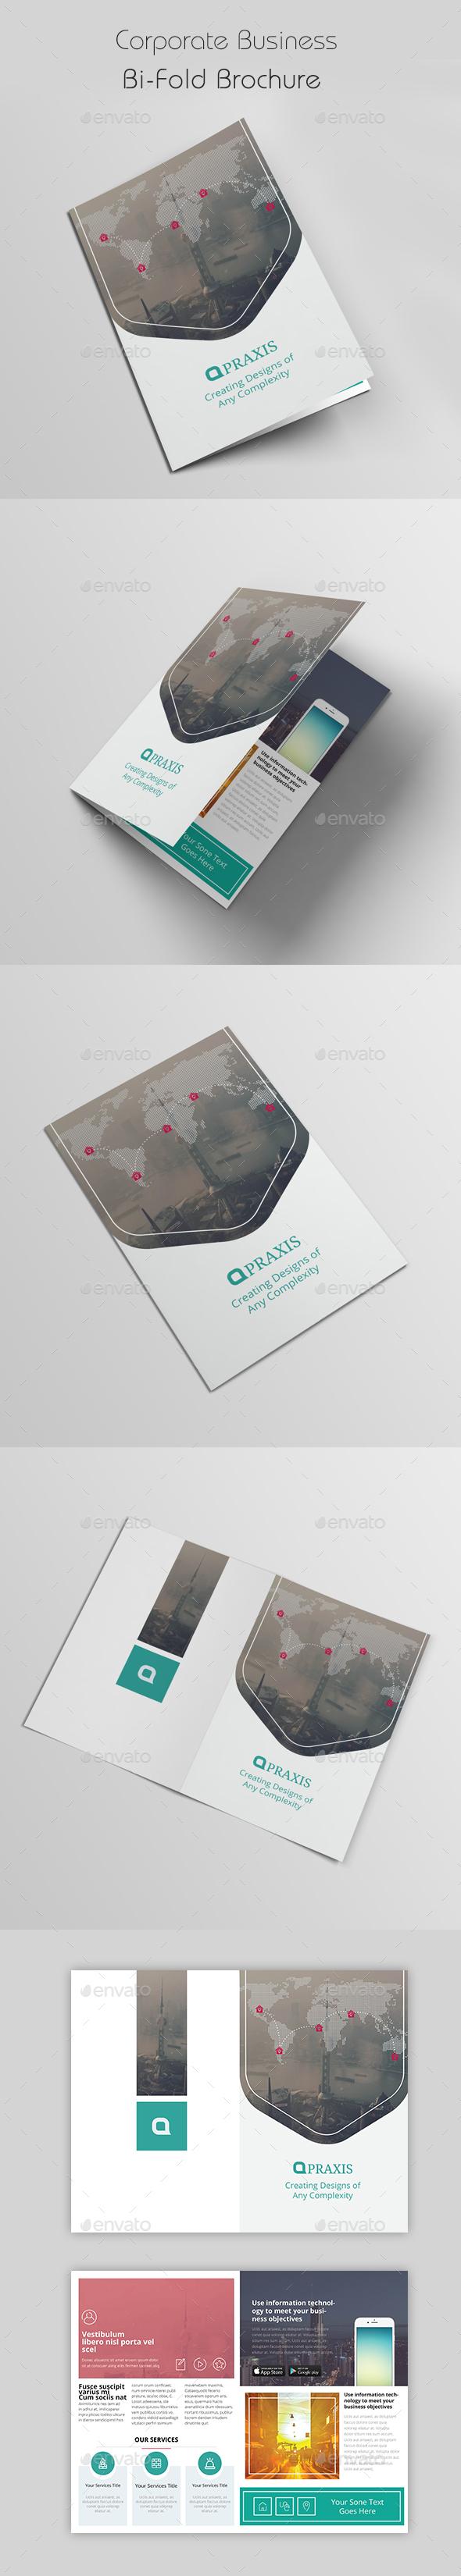 Corporate Business Bi-Fold Brochure - Brochures Print Templates